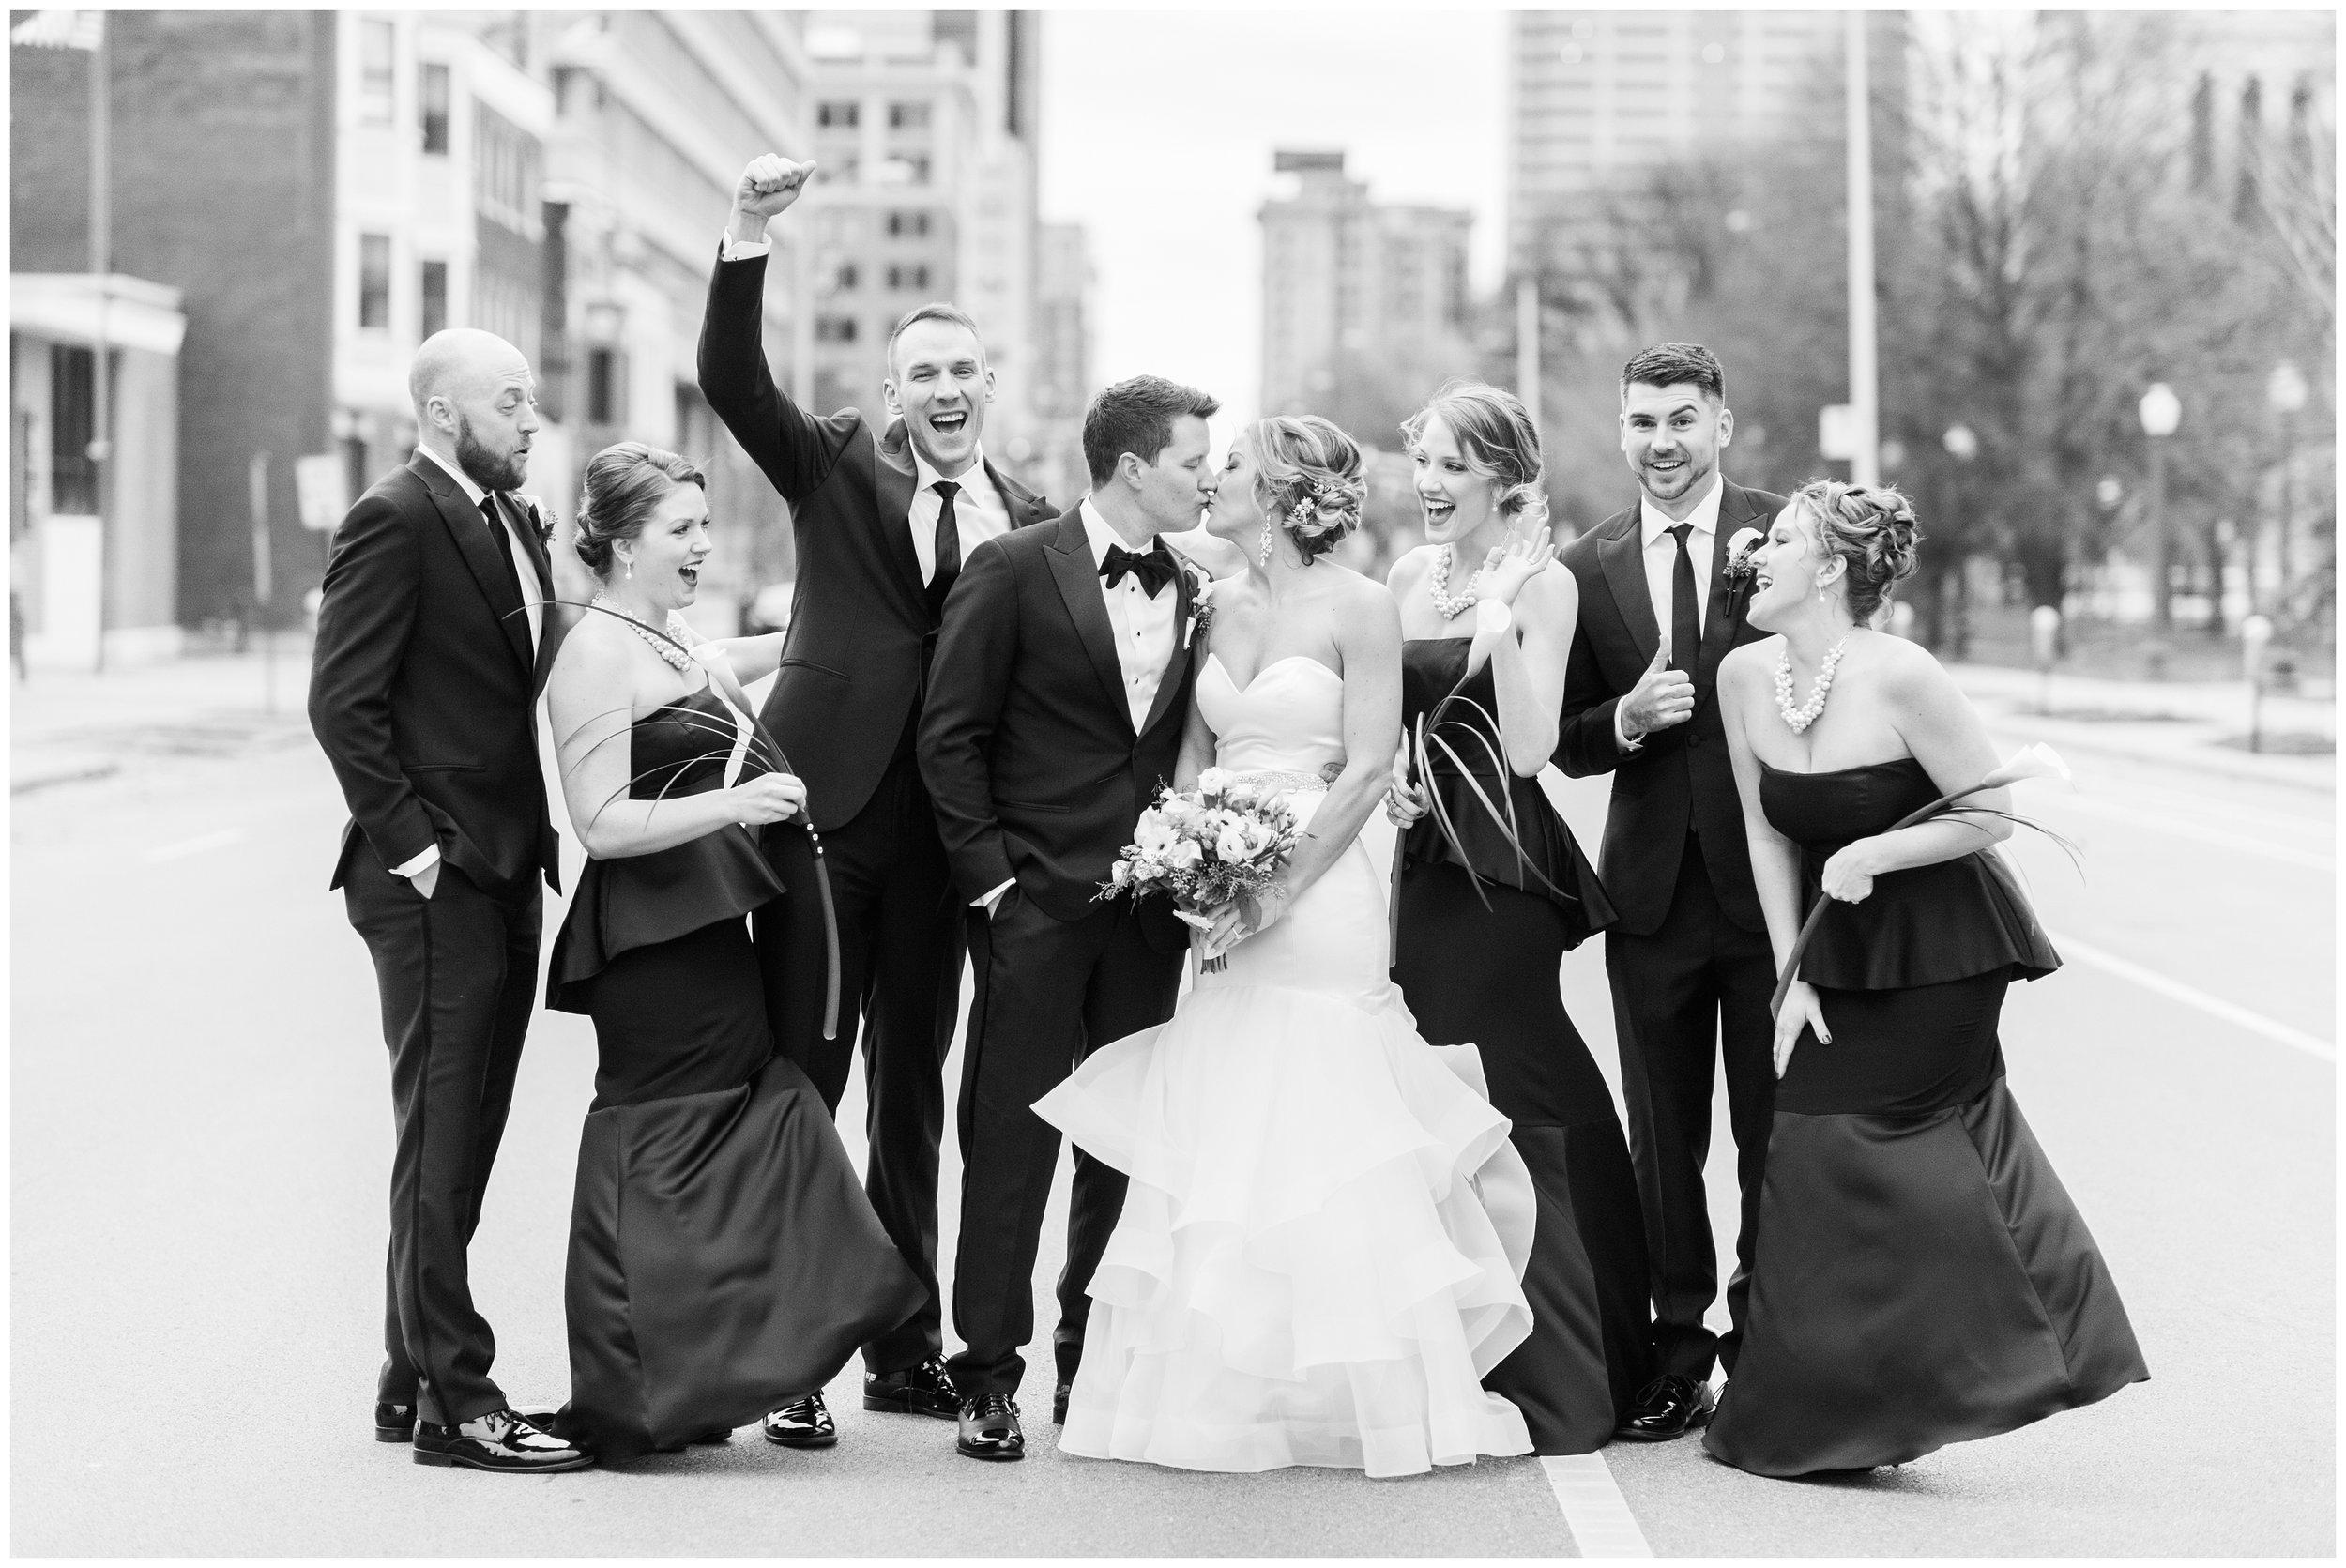 Rebecca_Bridges_Photography_Indianapolis_Wedding_Photographer_5819.jpg